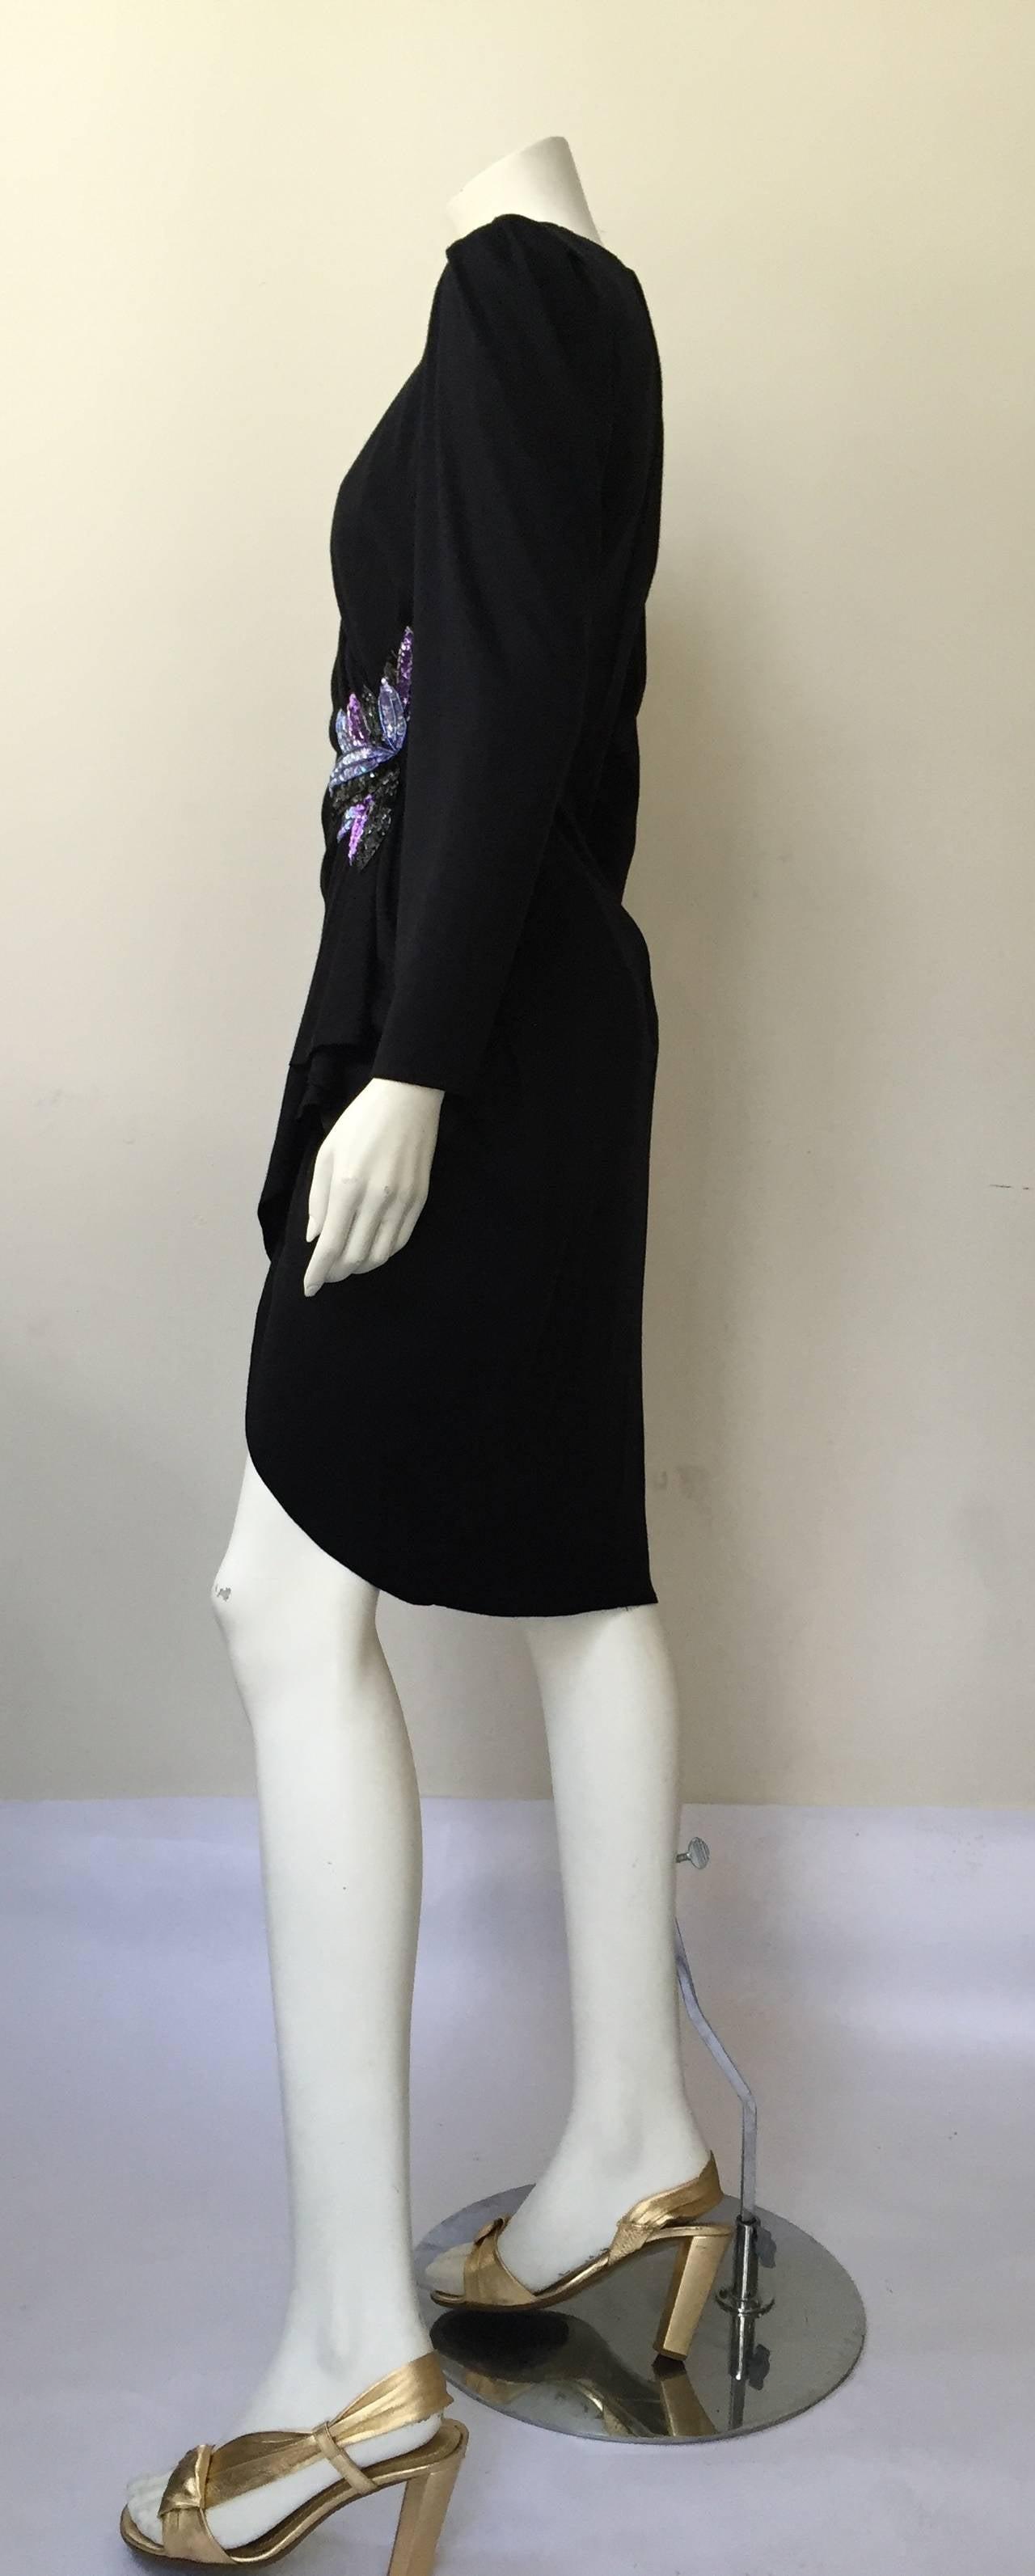 Zandra Rhodes 1980s Black with Sequin Dress Size 6. 7